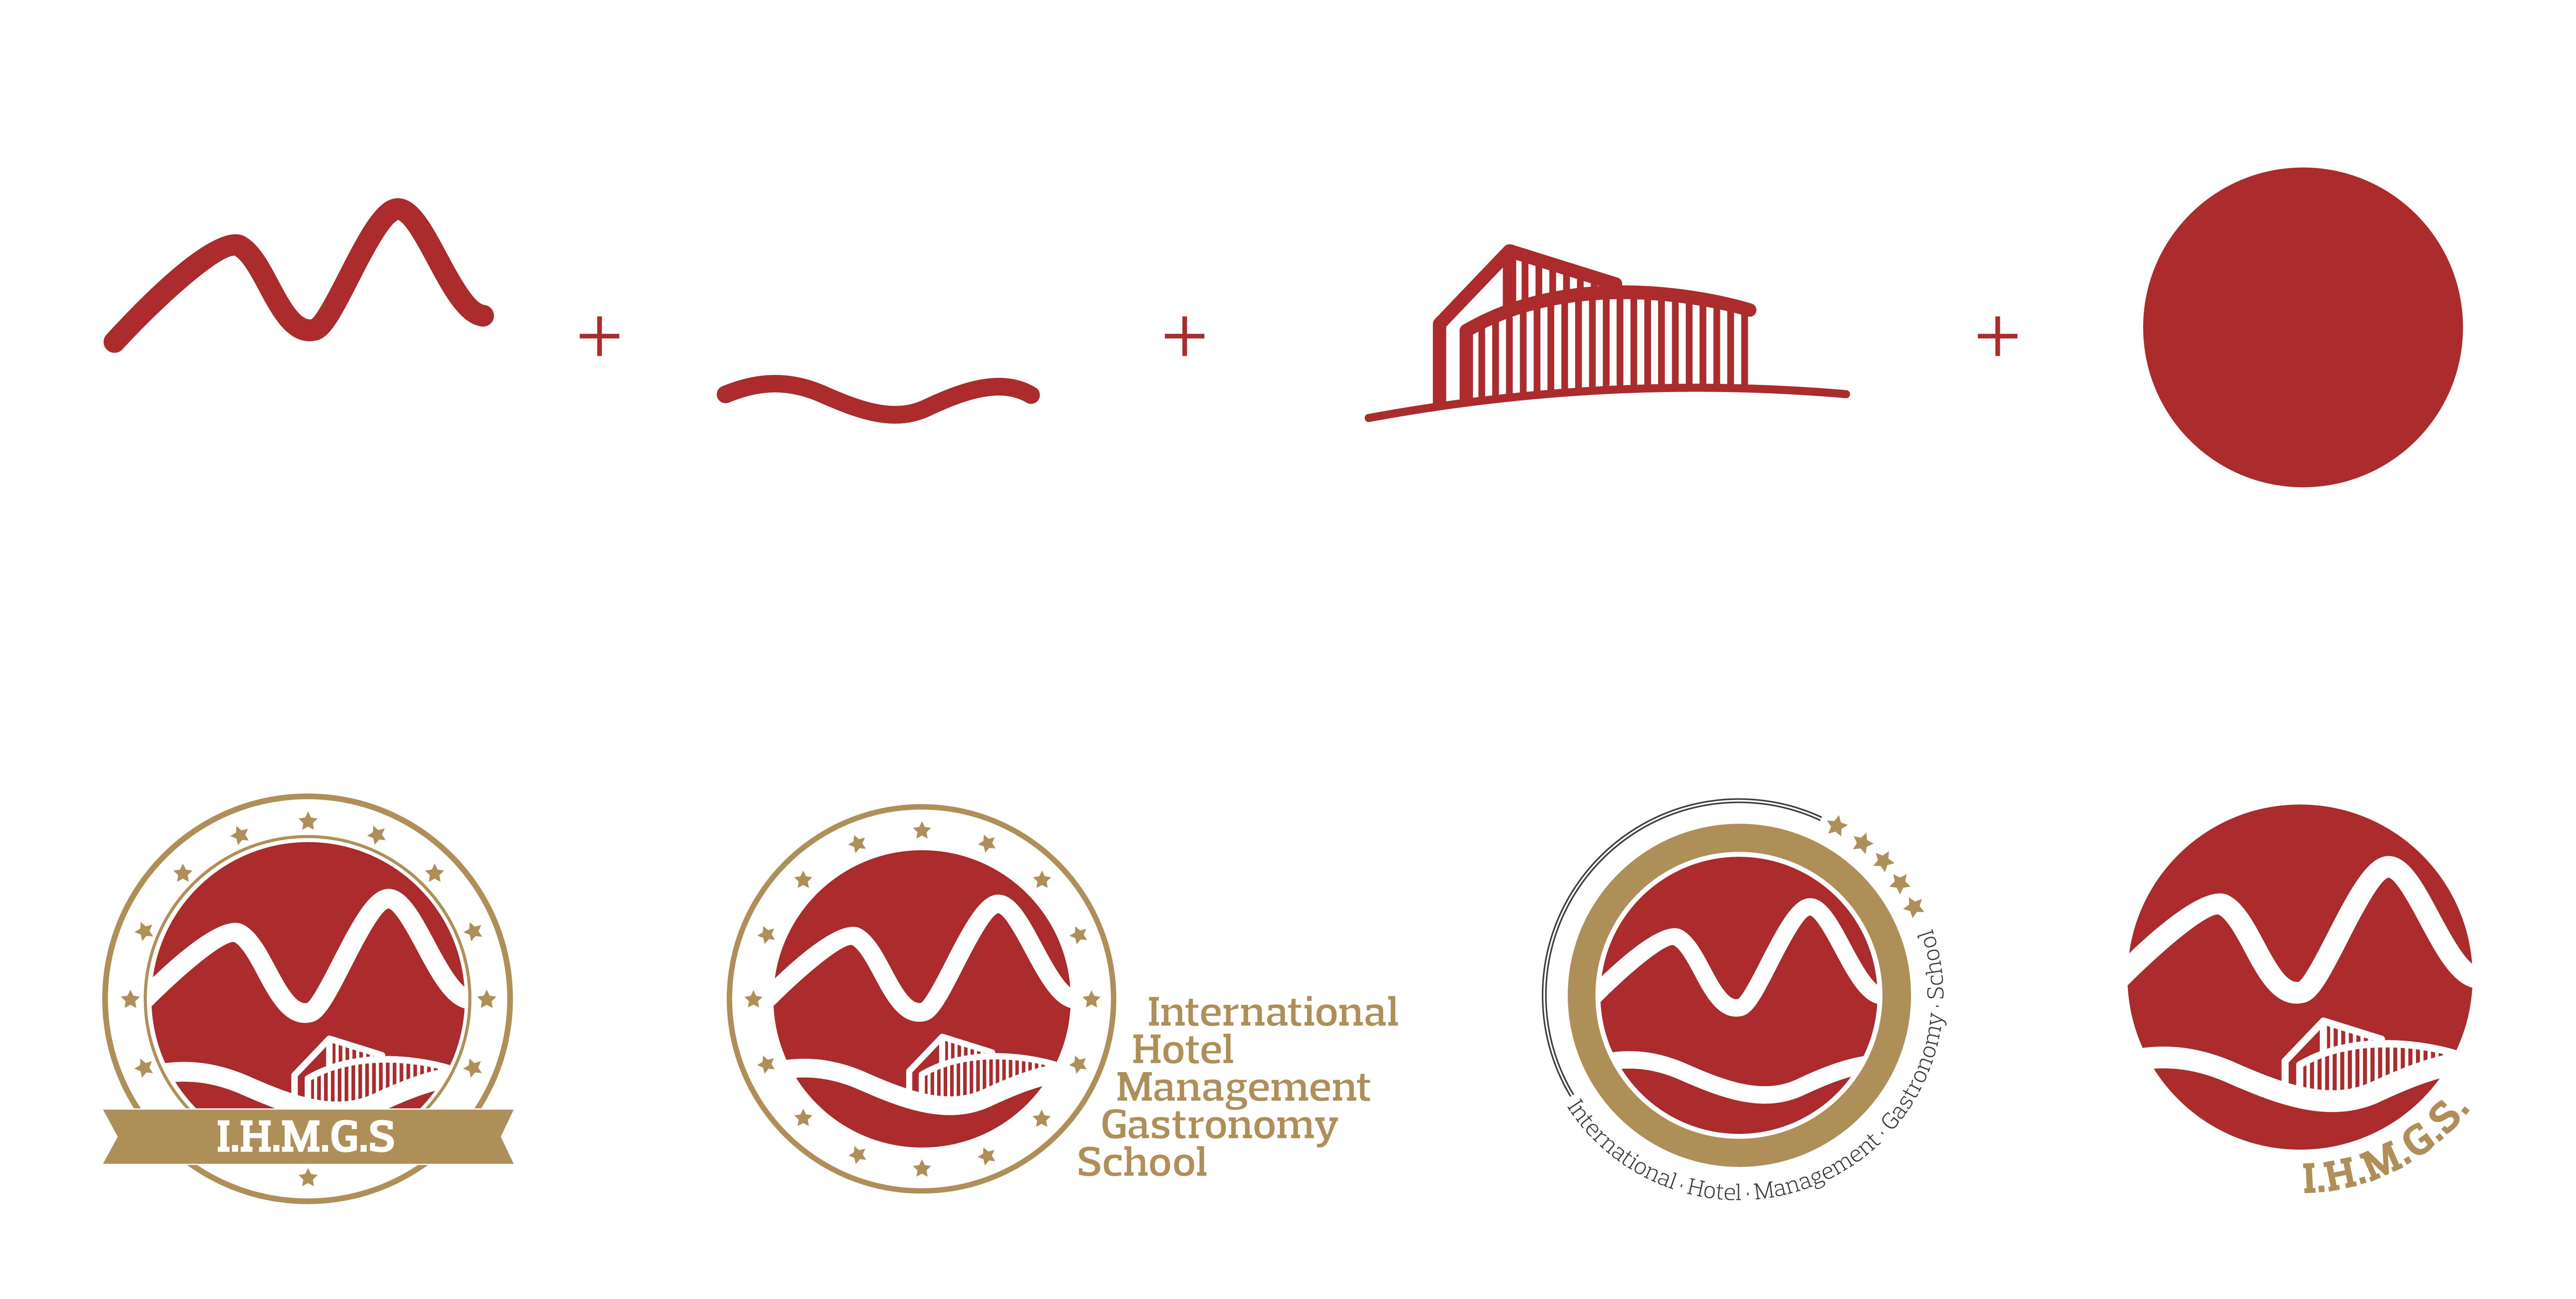 archicercle - logo ihmgs